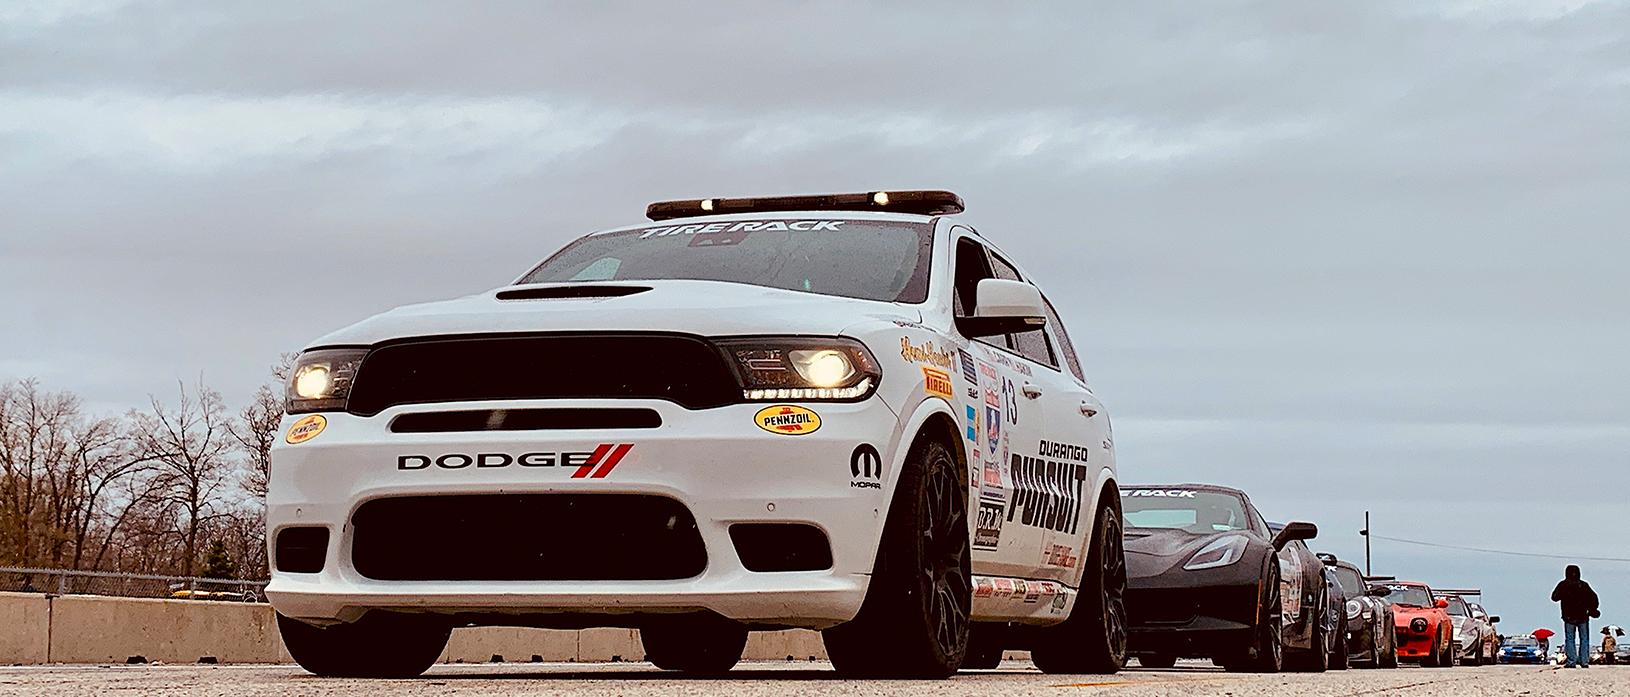 Durango Pursuit racing in OLOA